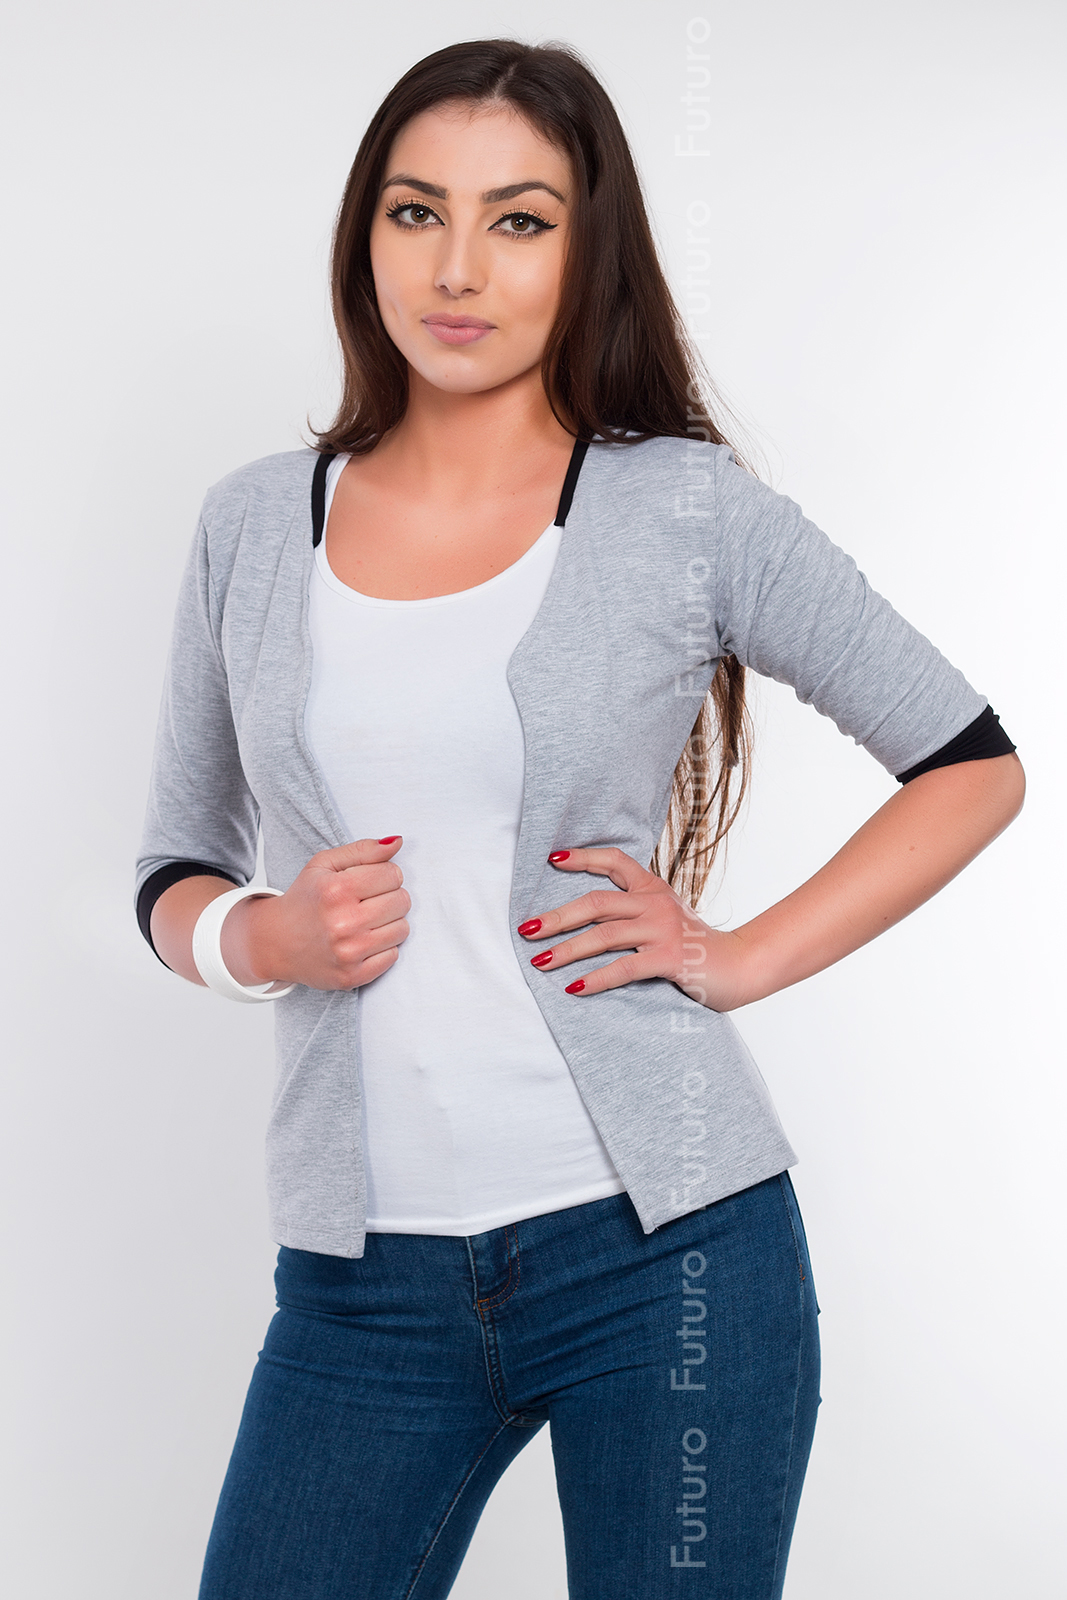 Blazer With Pockets 3//4 Sleeve Cardigan Jacket Shrug Bolero Cuff Sizes 8-16 2501